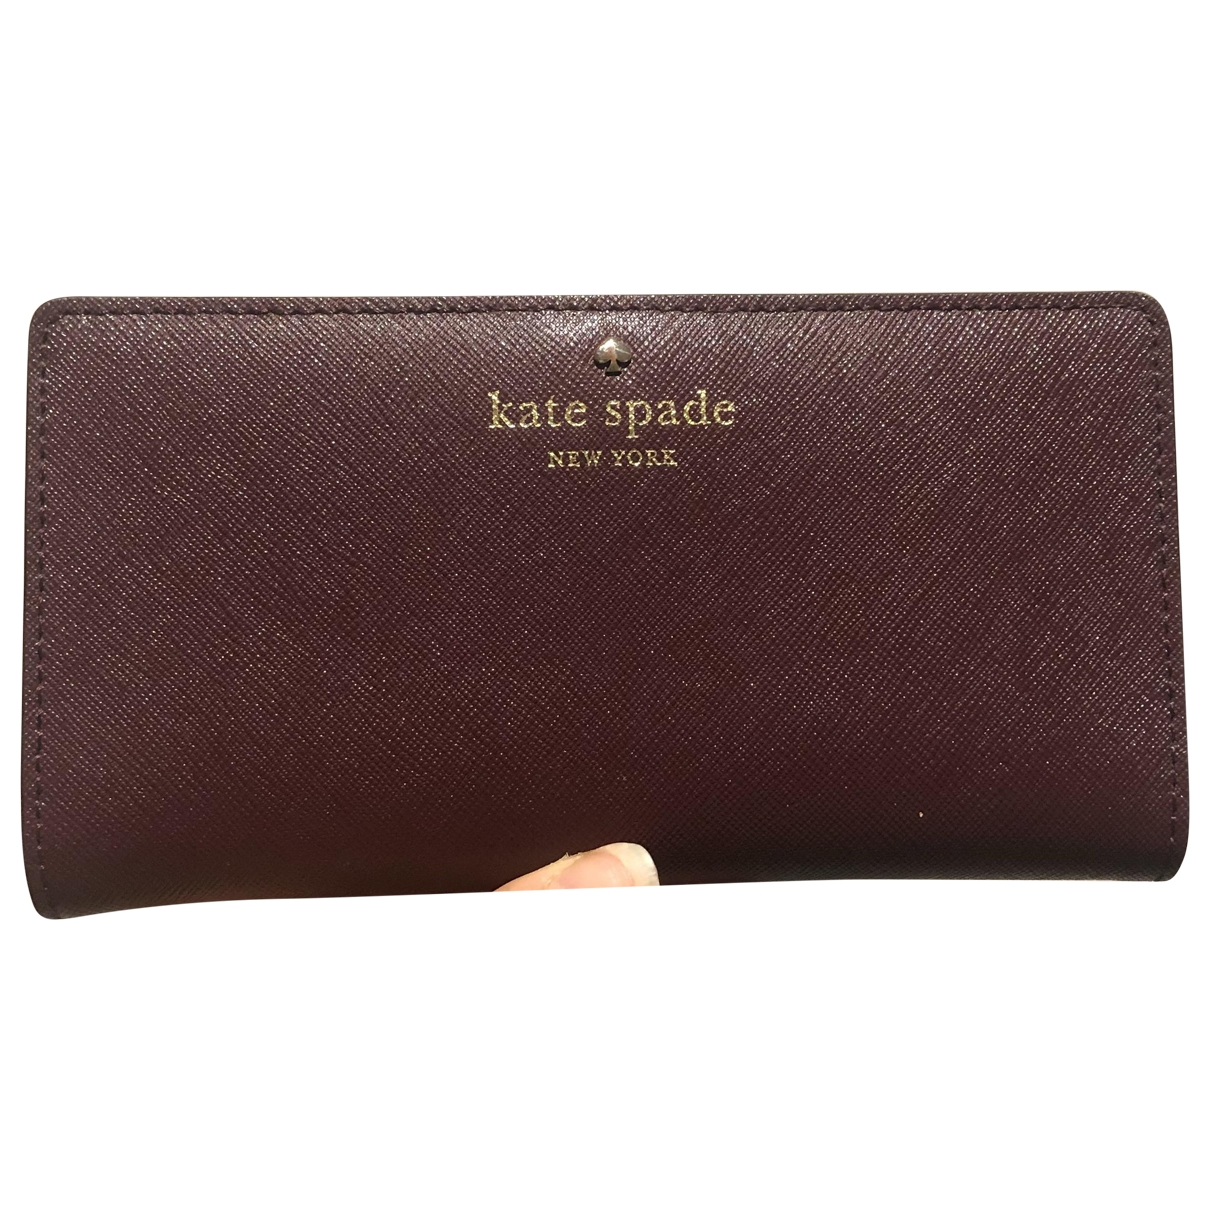 Tarjetero de Cuero Kate Spade